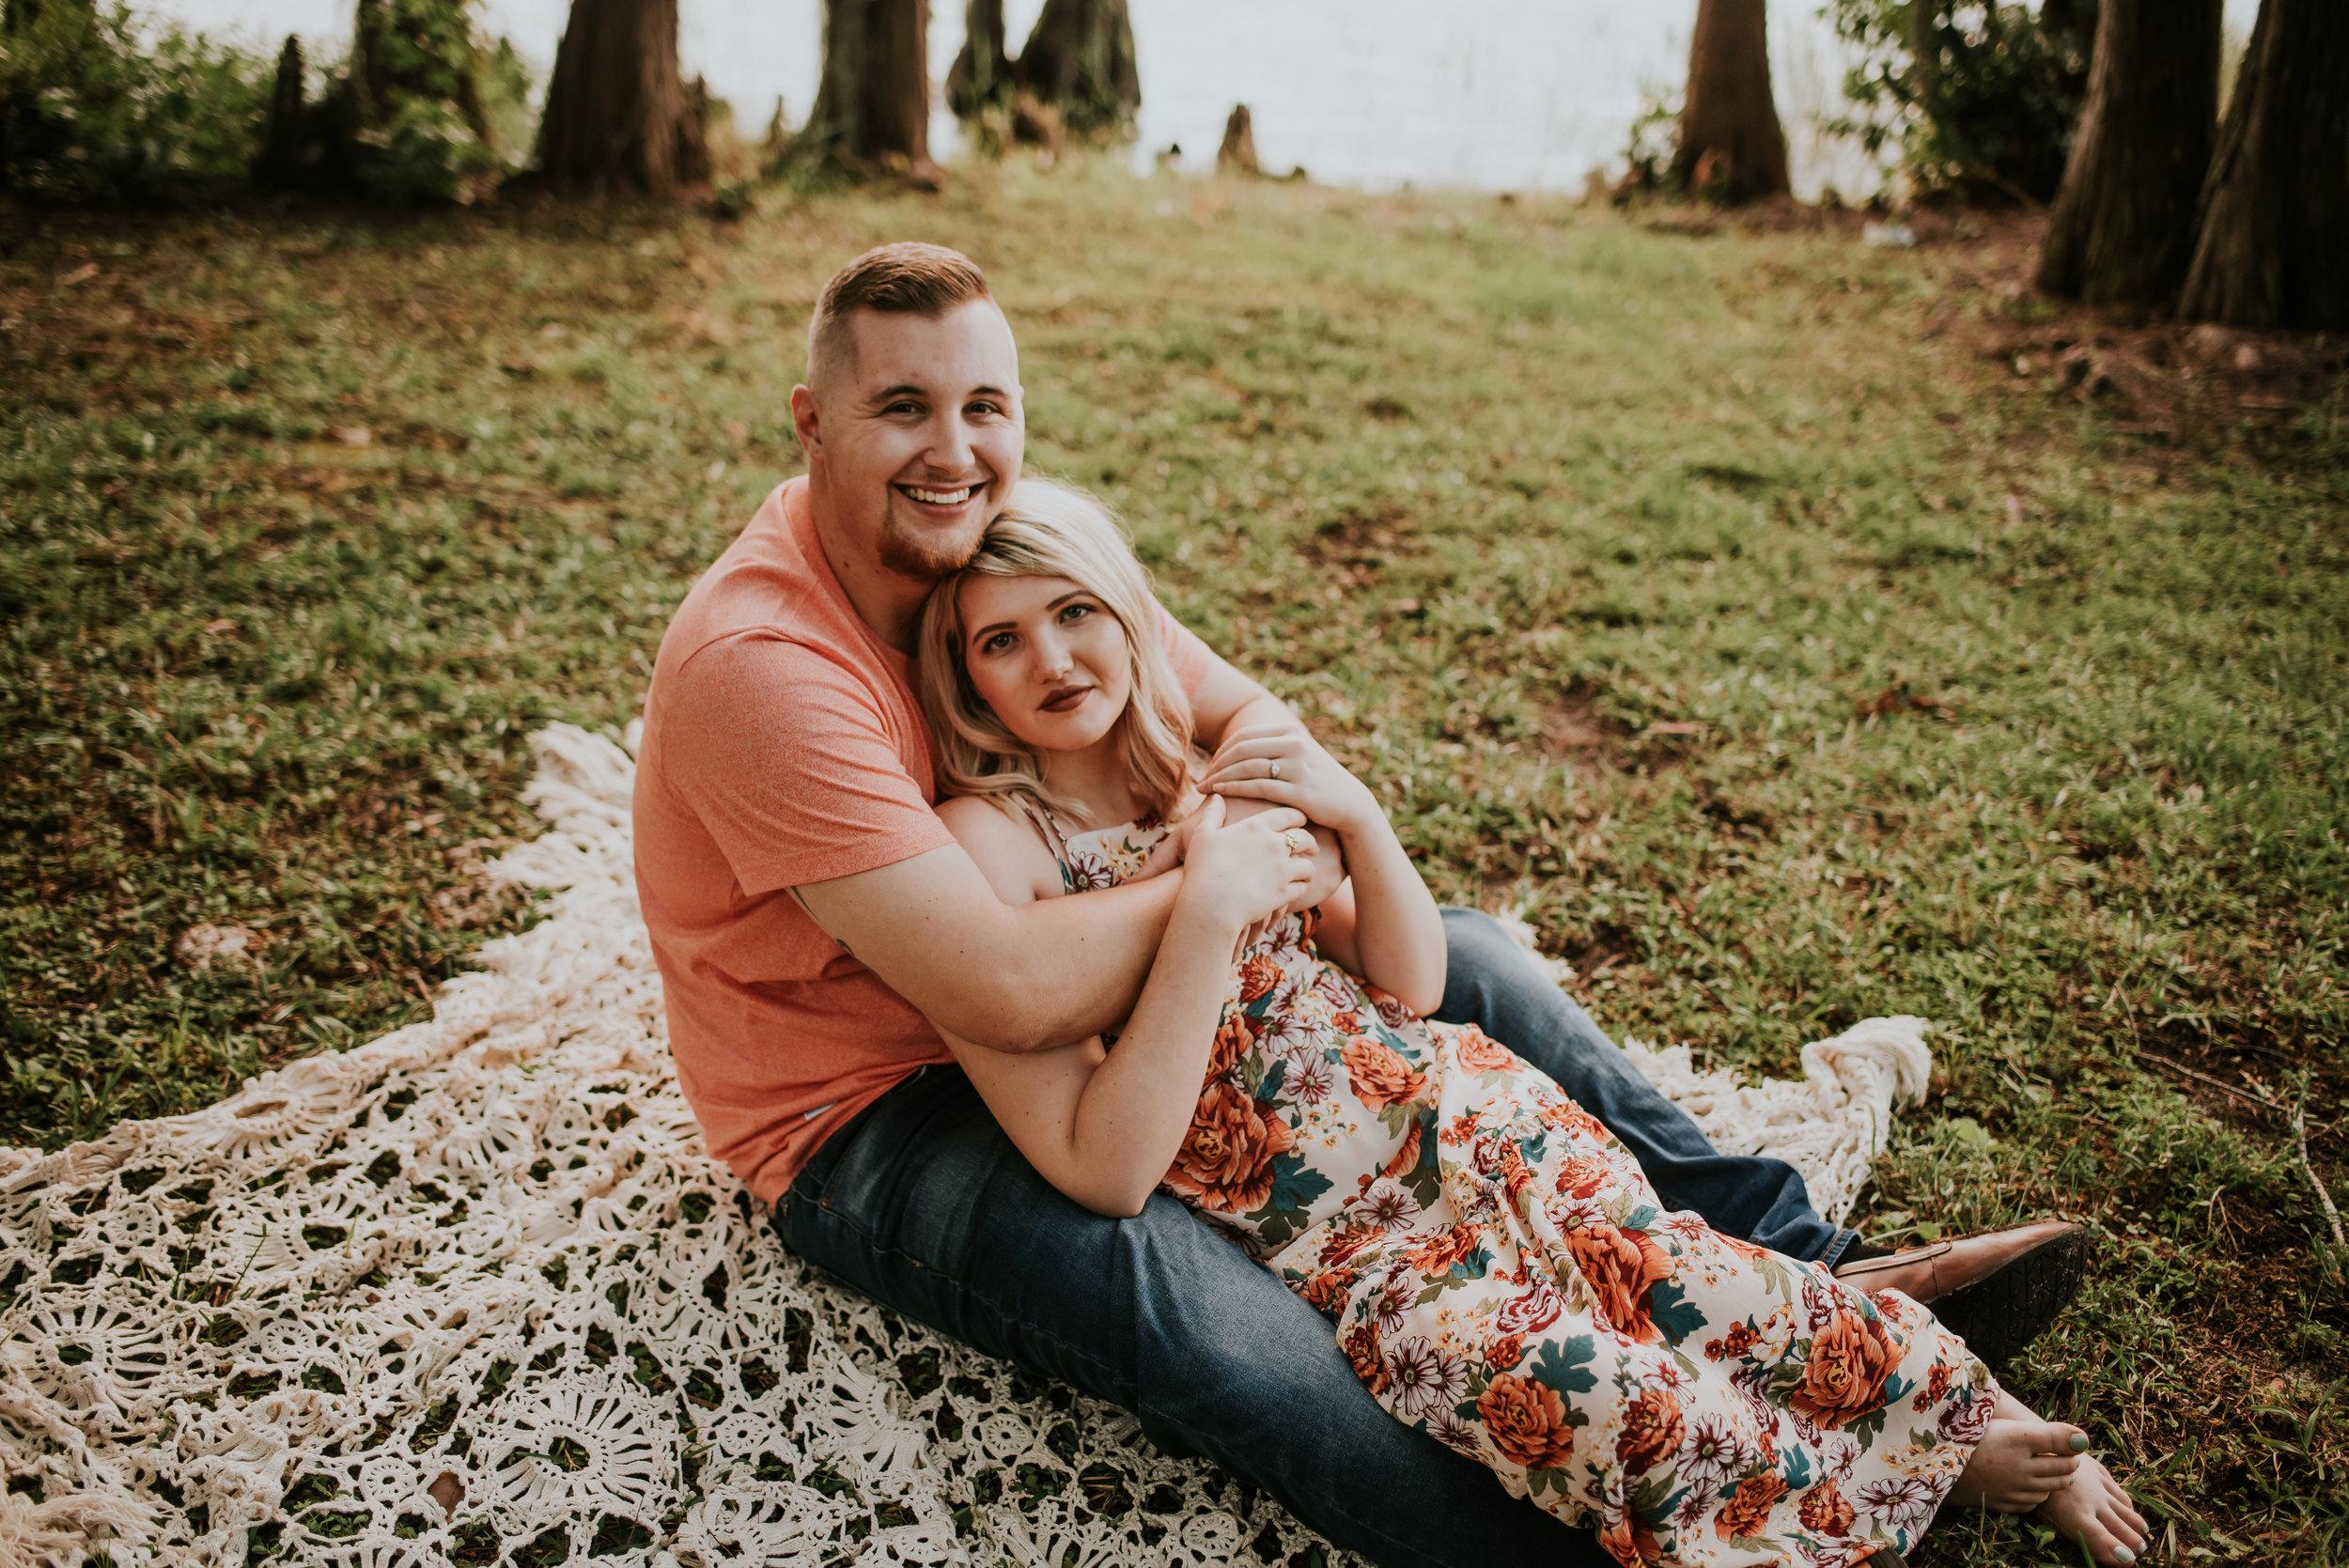 kimberly-trey-crestview-florida-couples-photographer-24.jpg